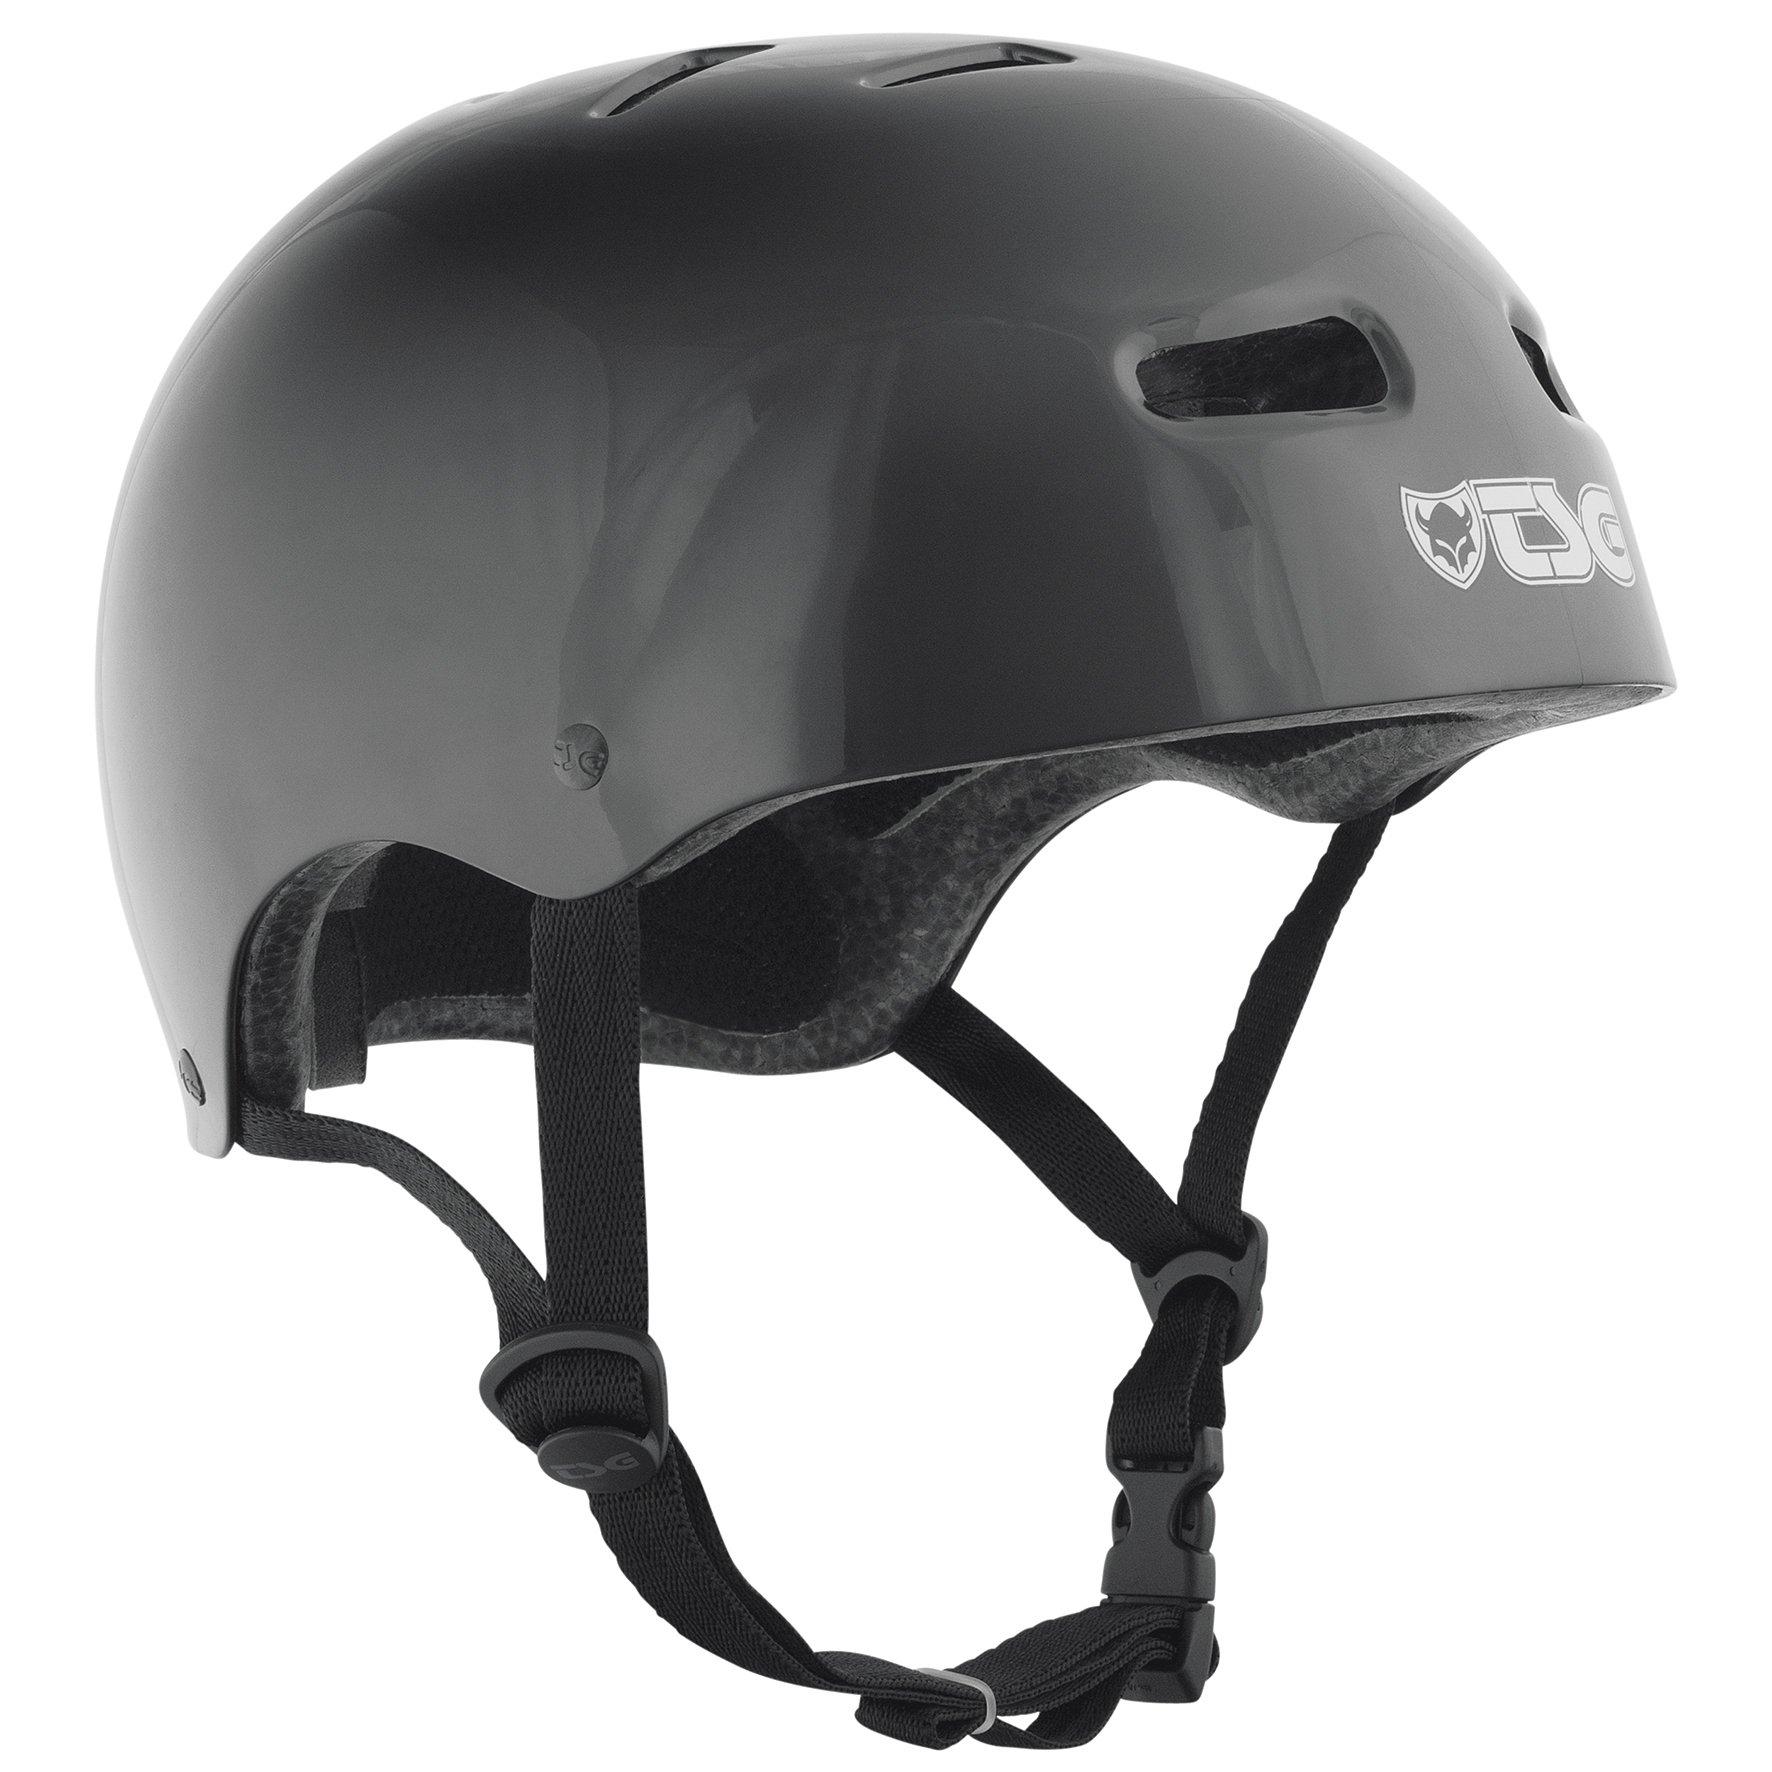 TSG Skate Helmet - Dirt, Jump, Skate, Scooter, BMX Bike Pisspot - Black LG/XL